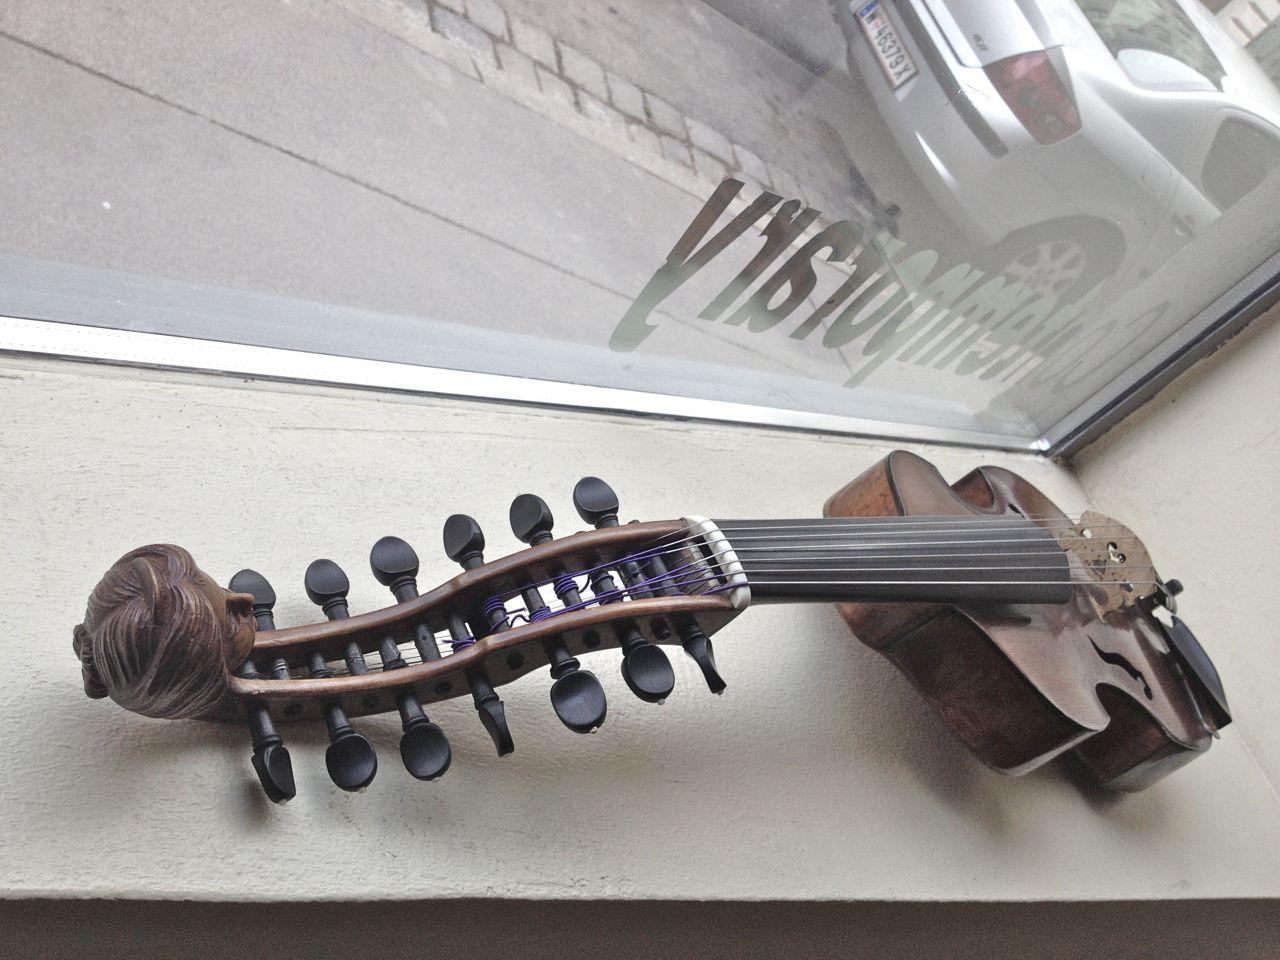 The Viennese instrument at Klangforum.